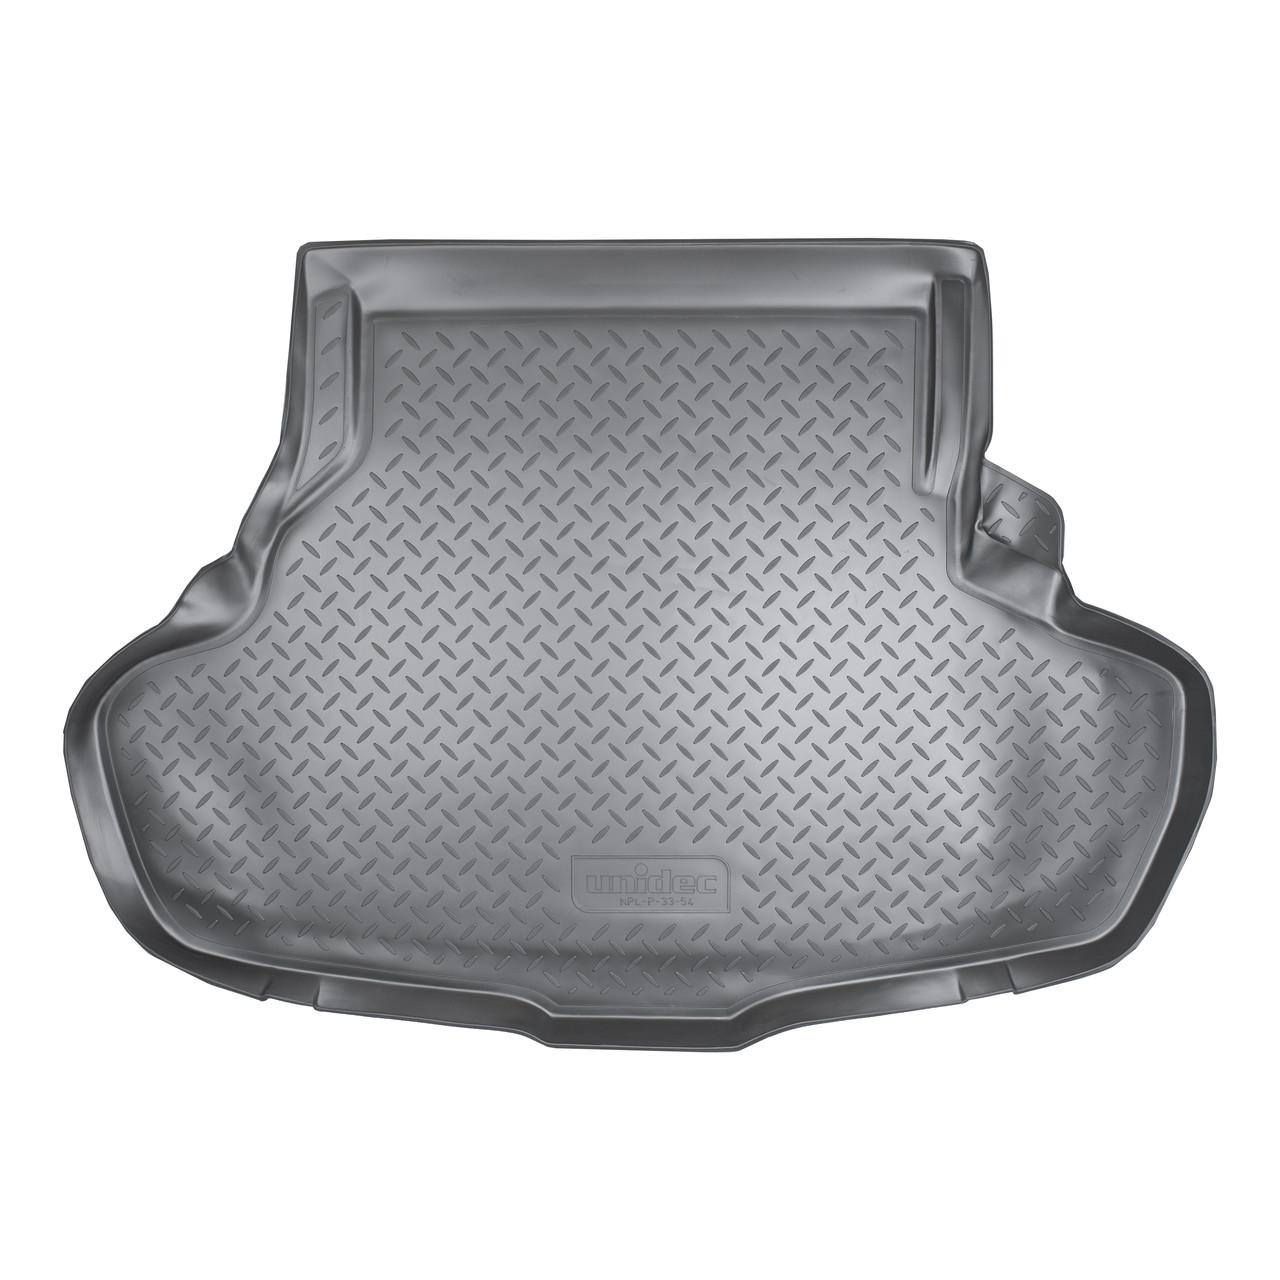 Коврик в багажник Infiniti G25 (V36) SD (2010)